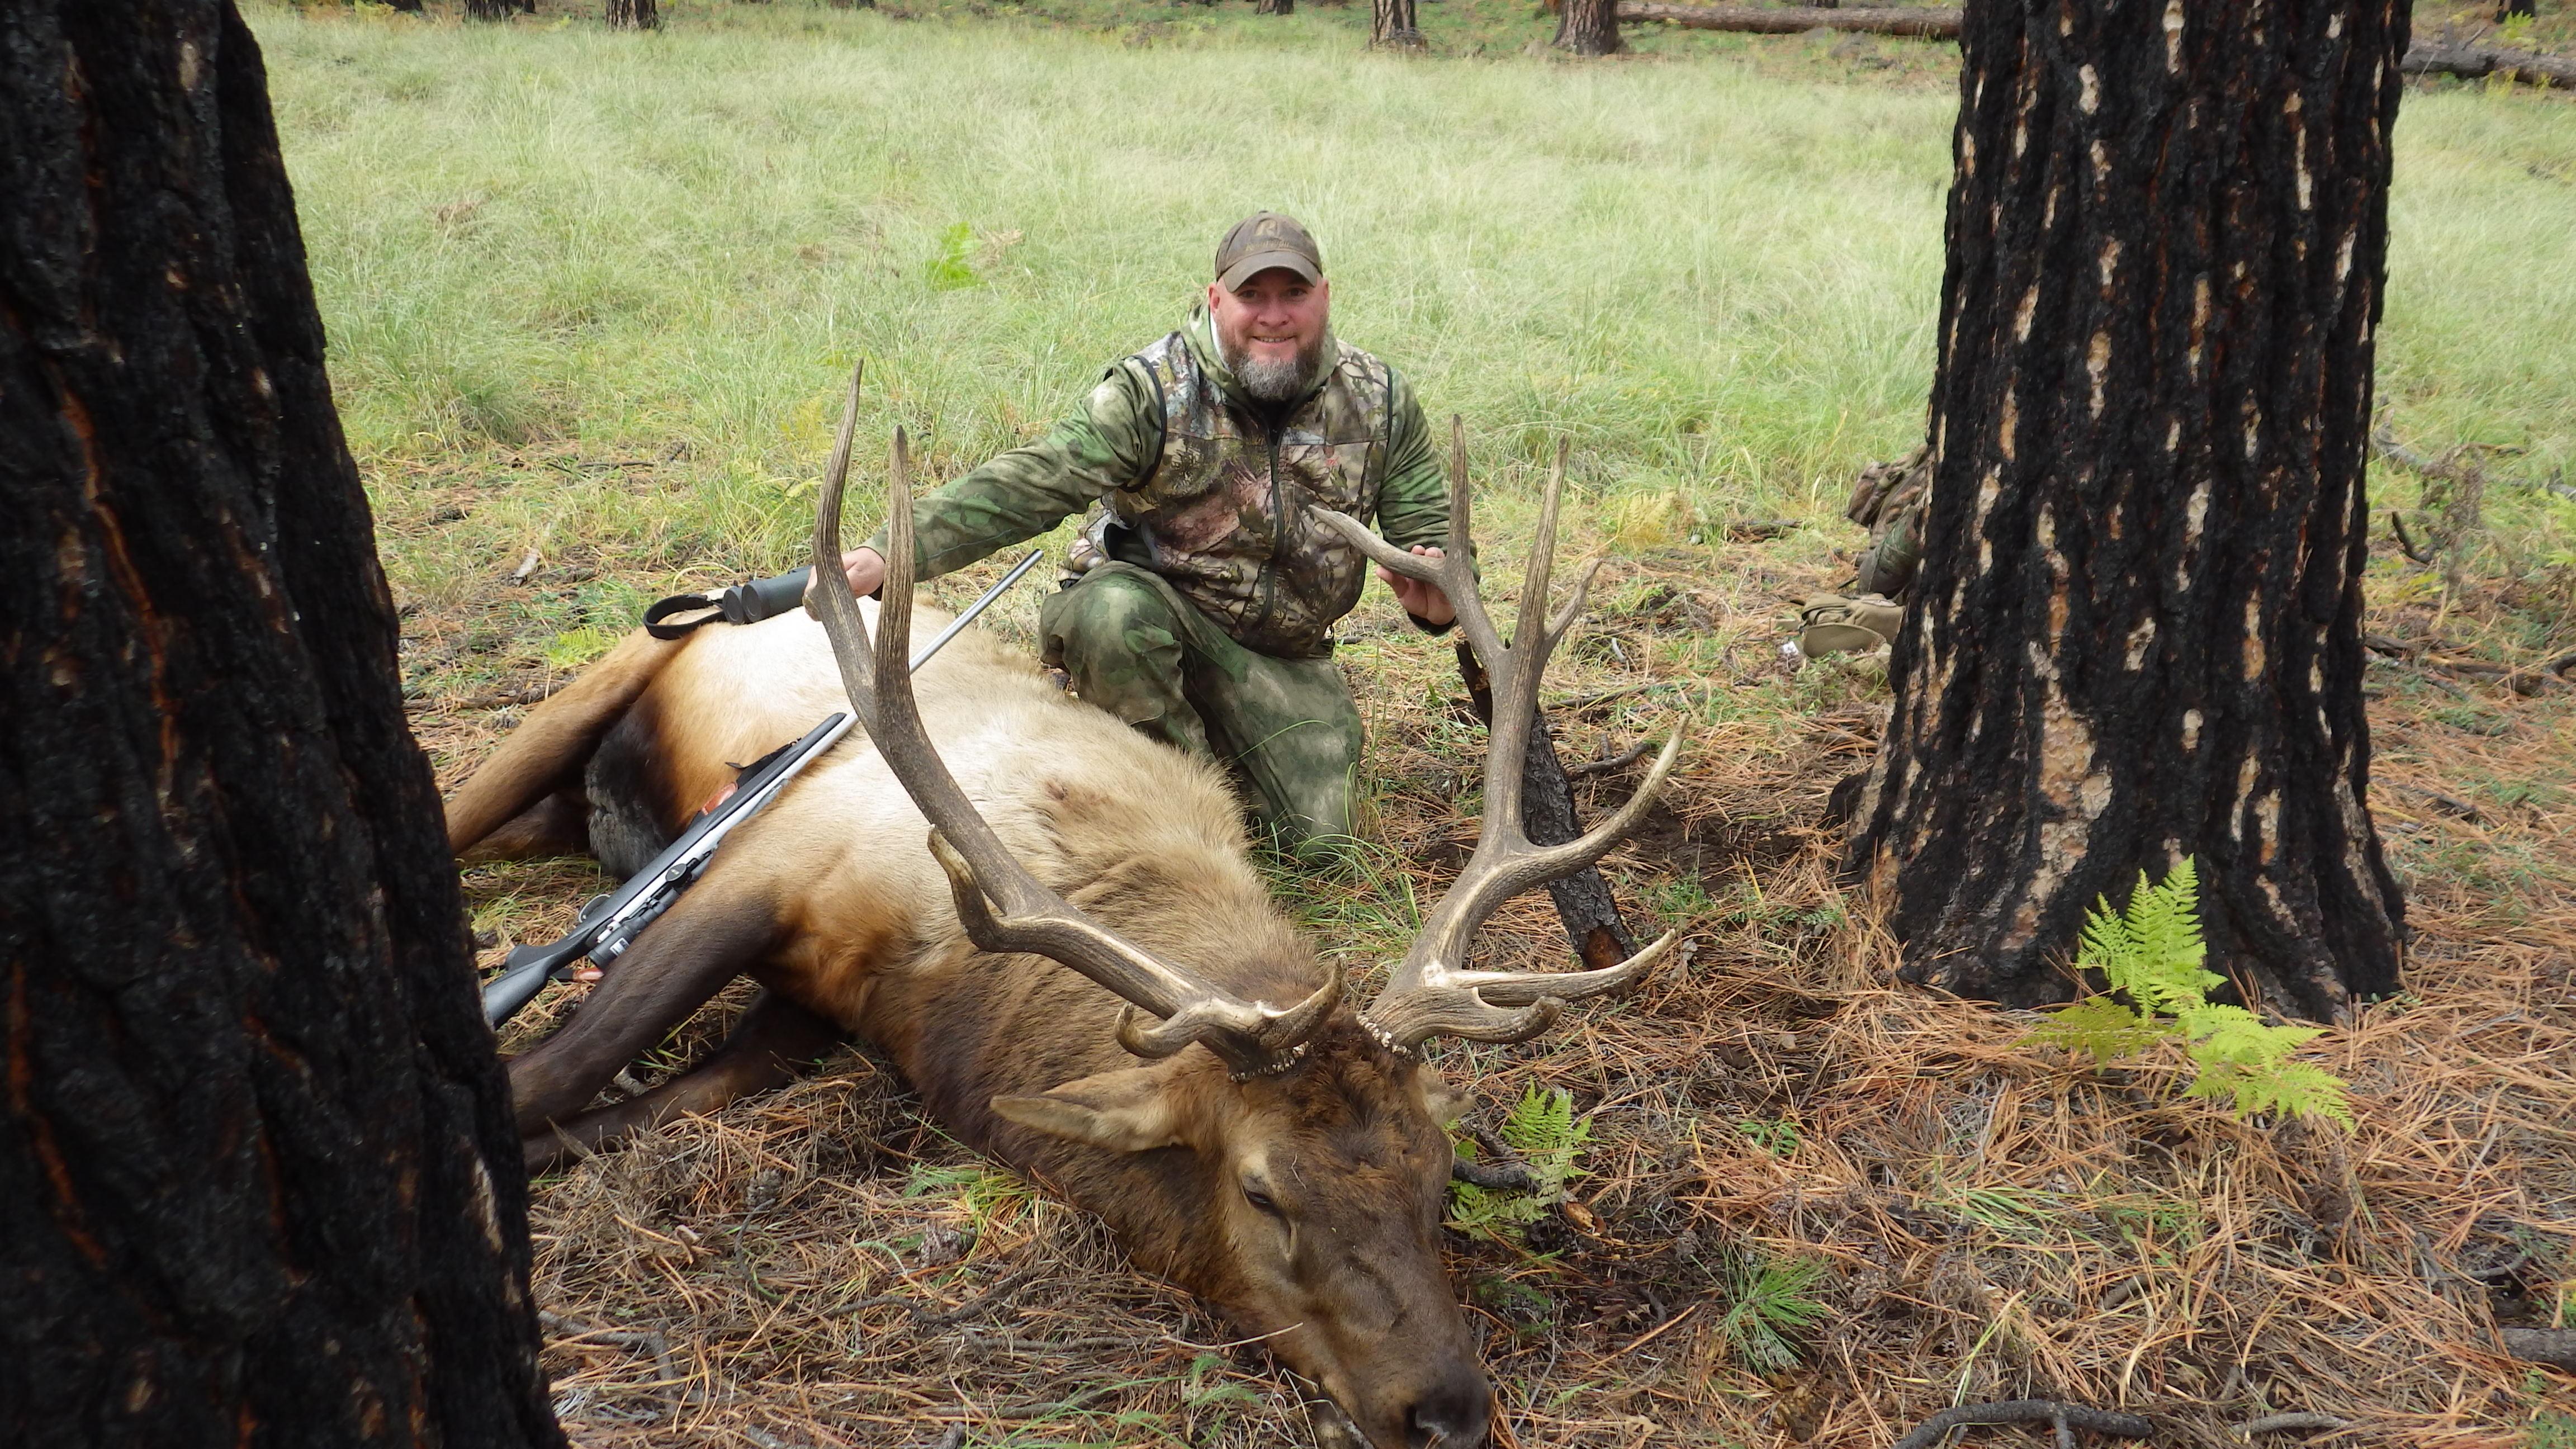 Aaron Mayle, WV - 6x7 Bull Rifle